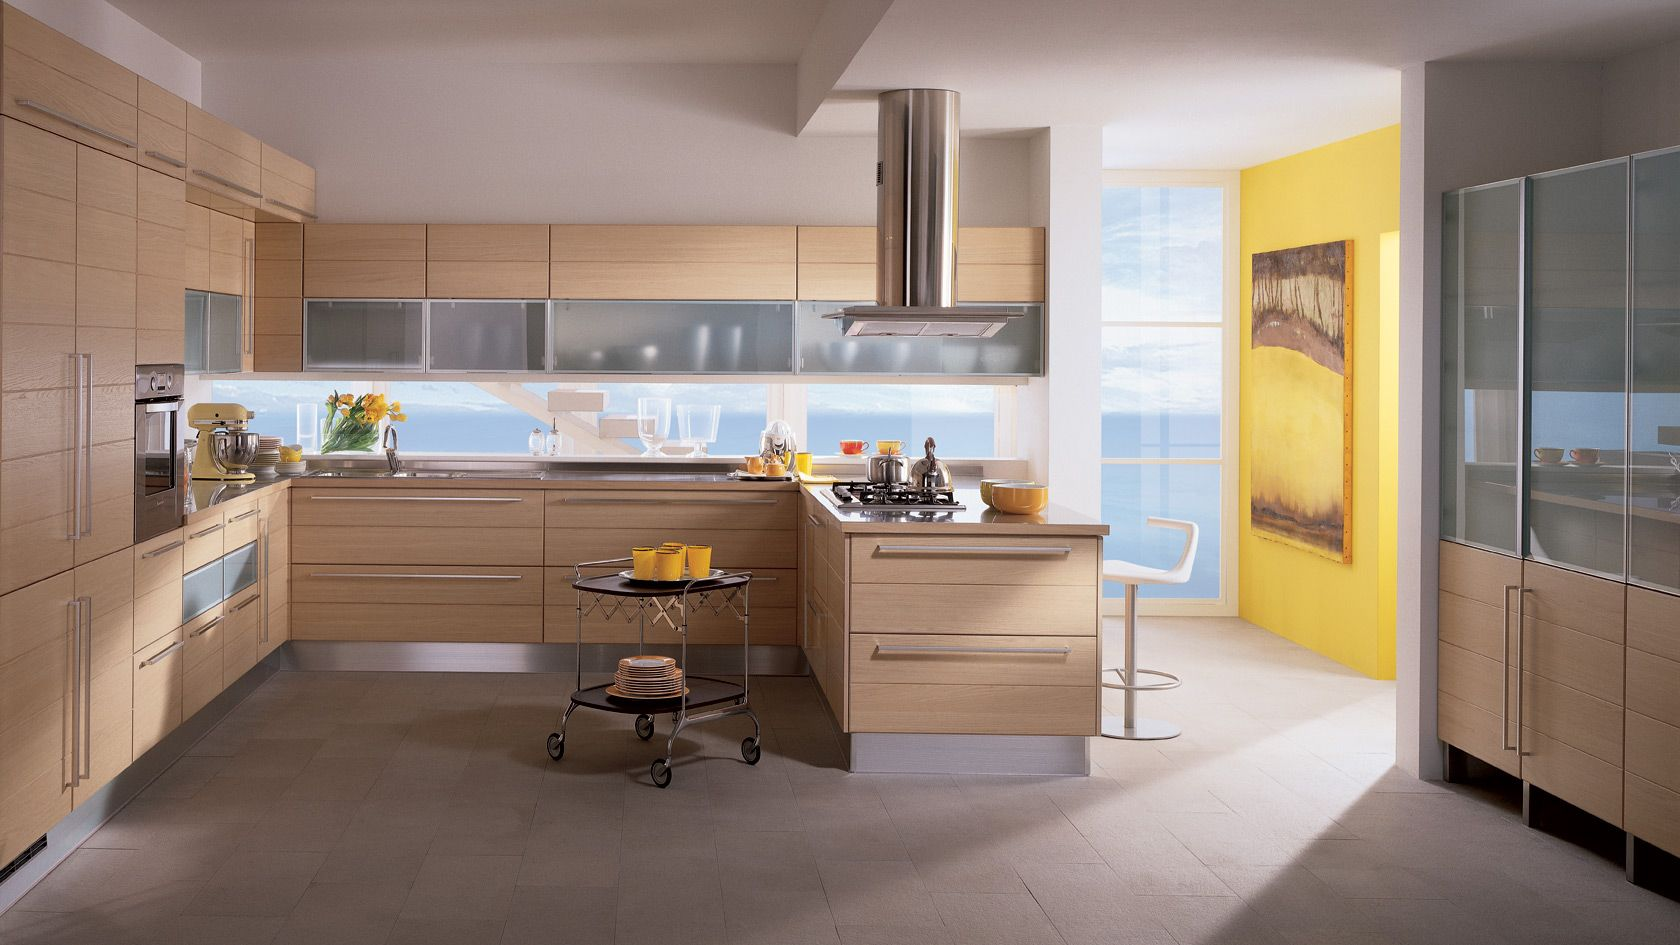 Stunning Qualità Cucine Scavolini Ideas - harrop.us - harrop.us